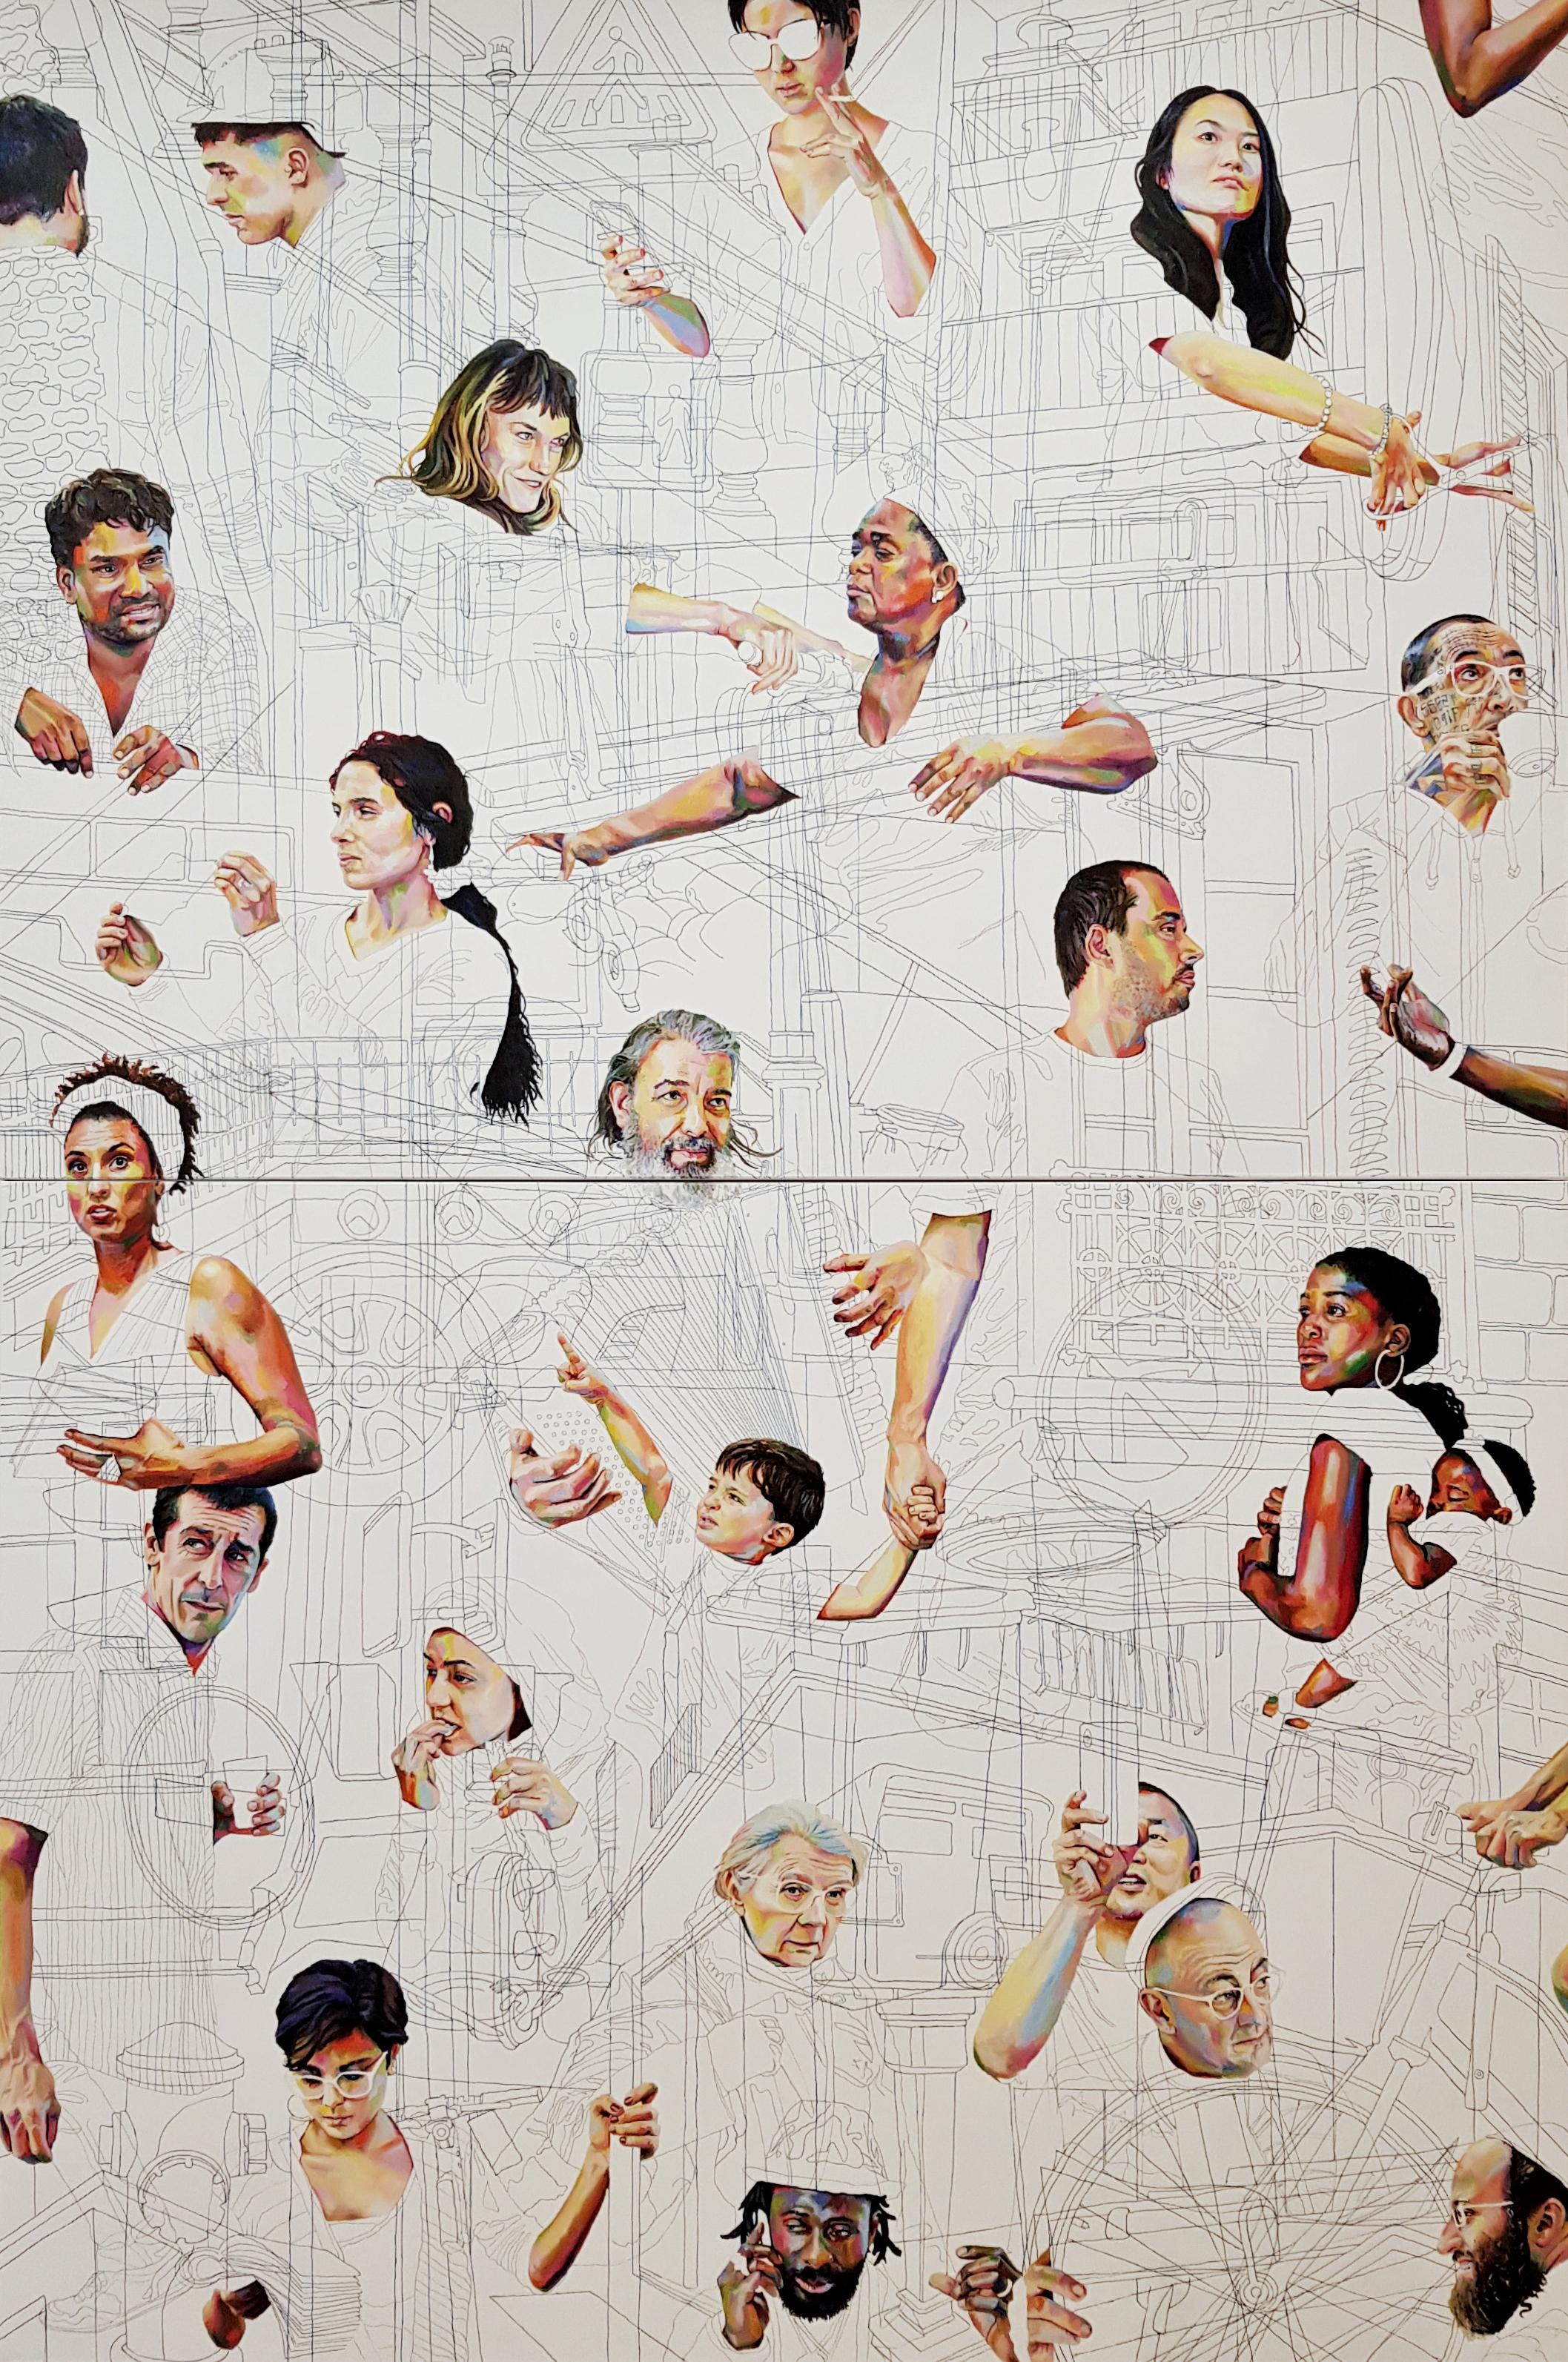 La ville, Eduardo Fonseca, 2020, acrylic